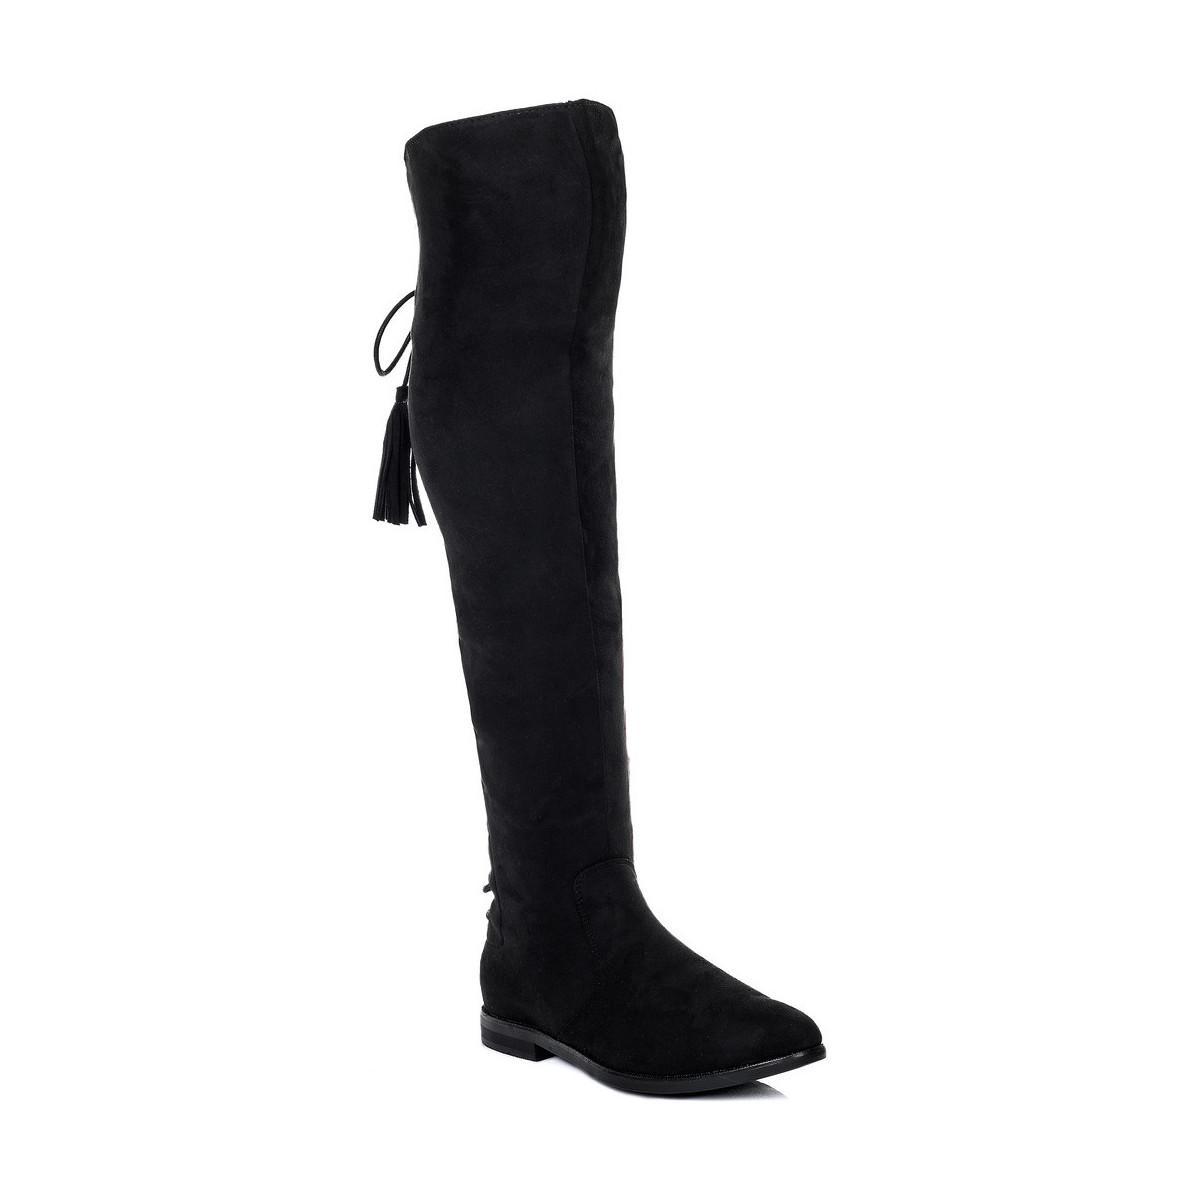 21b7e2a847c Spylovebuy Vive Stretch Flat Knee High Tall Boots - Black Suede ...